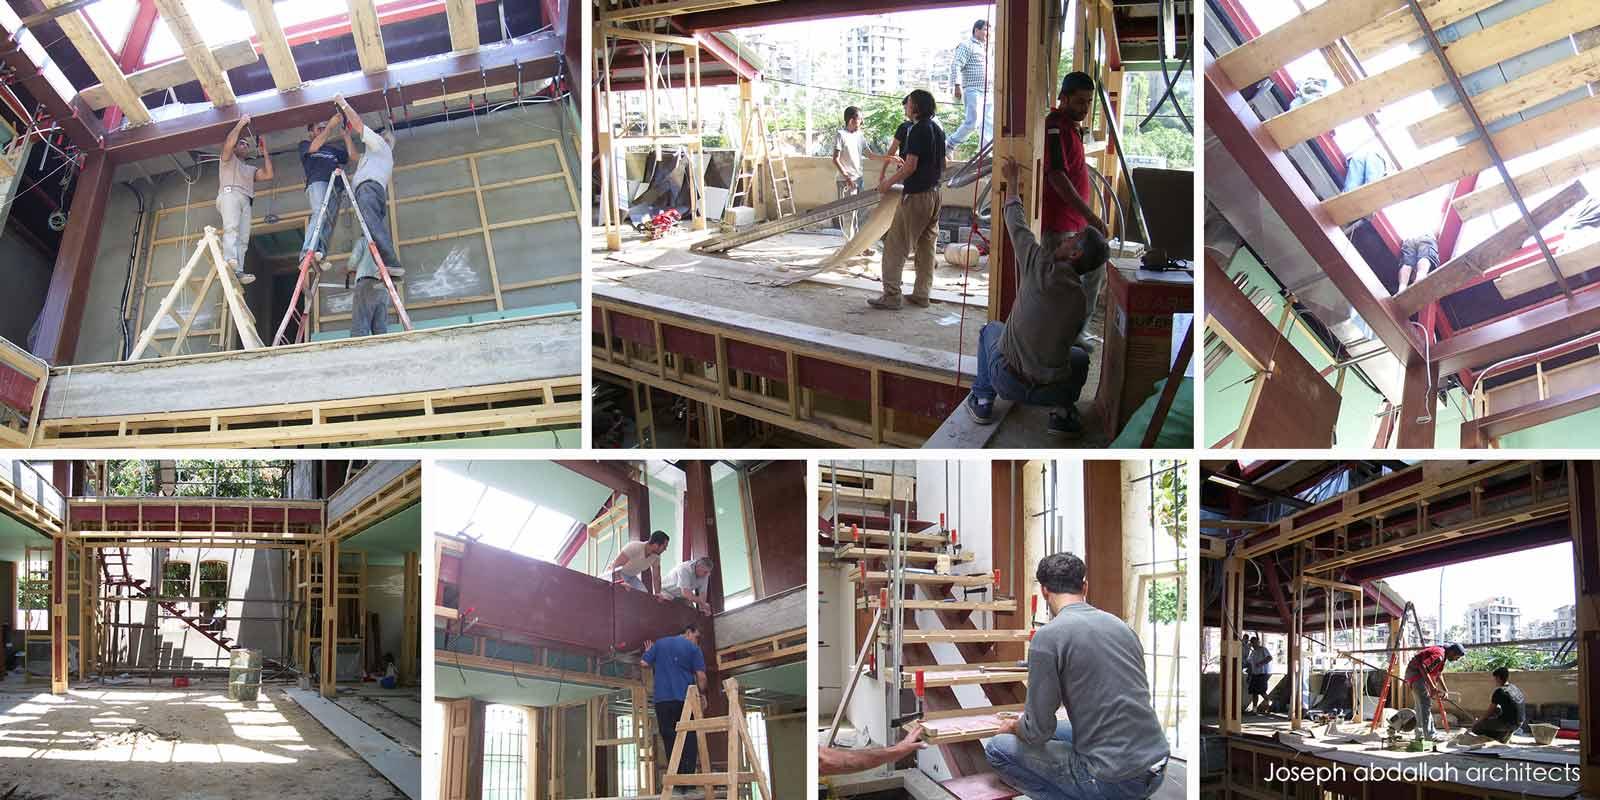 bank-lcb-sgbl-apotres-restoration-architecture-joseph-abdallah-architects-11